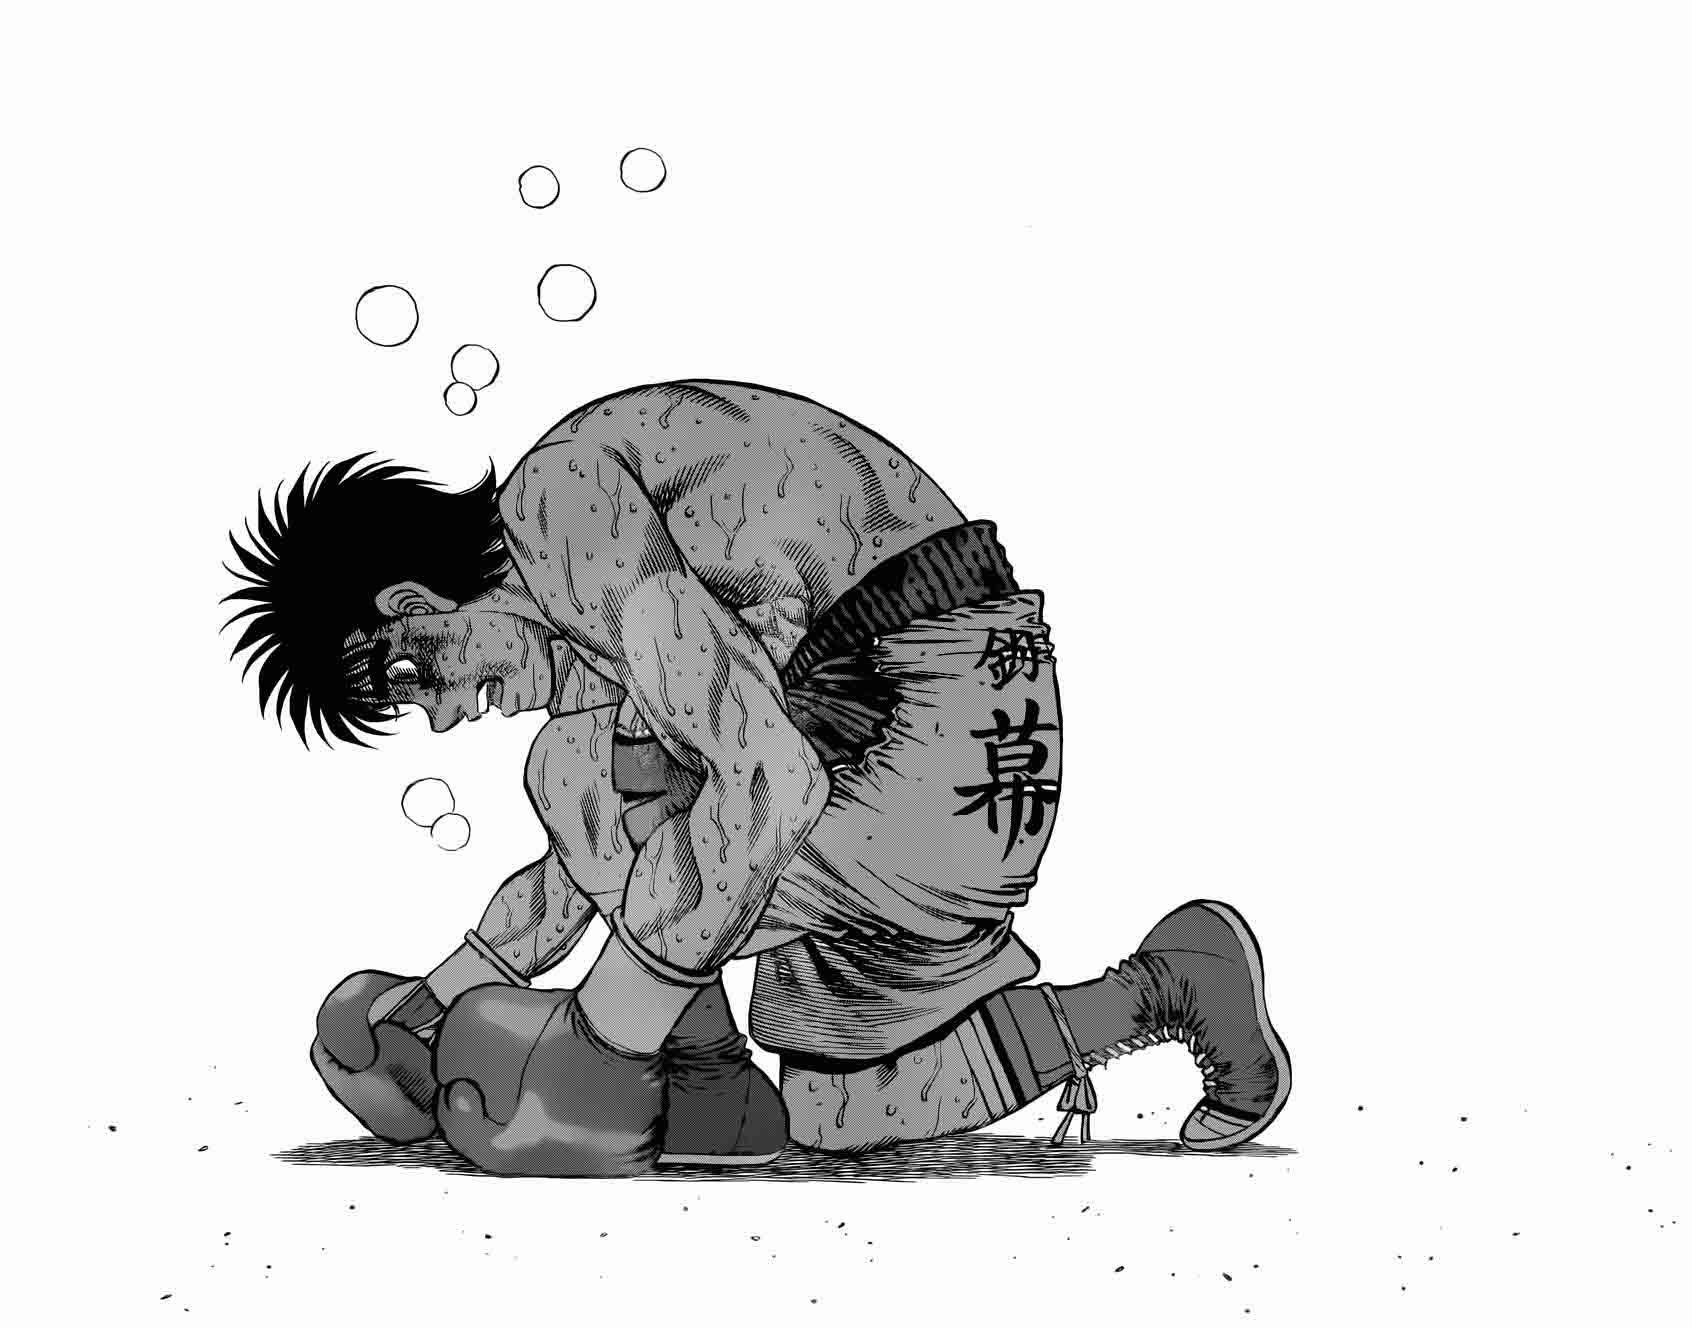 Hajime No Ippo Chapter 1197 Mymangalist Manga Covers Anime Wallpaper Manga Anime